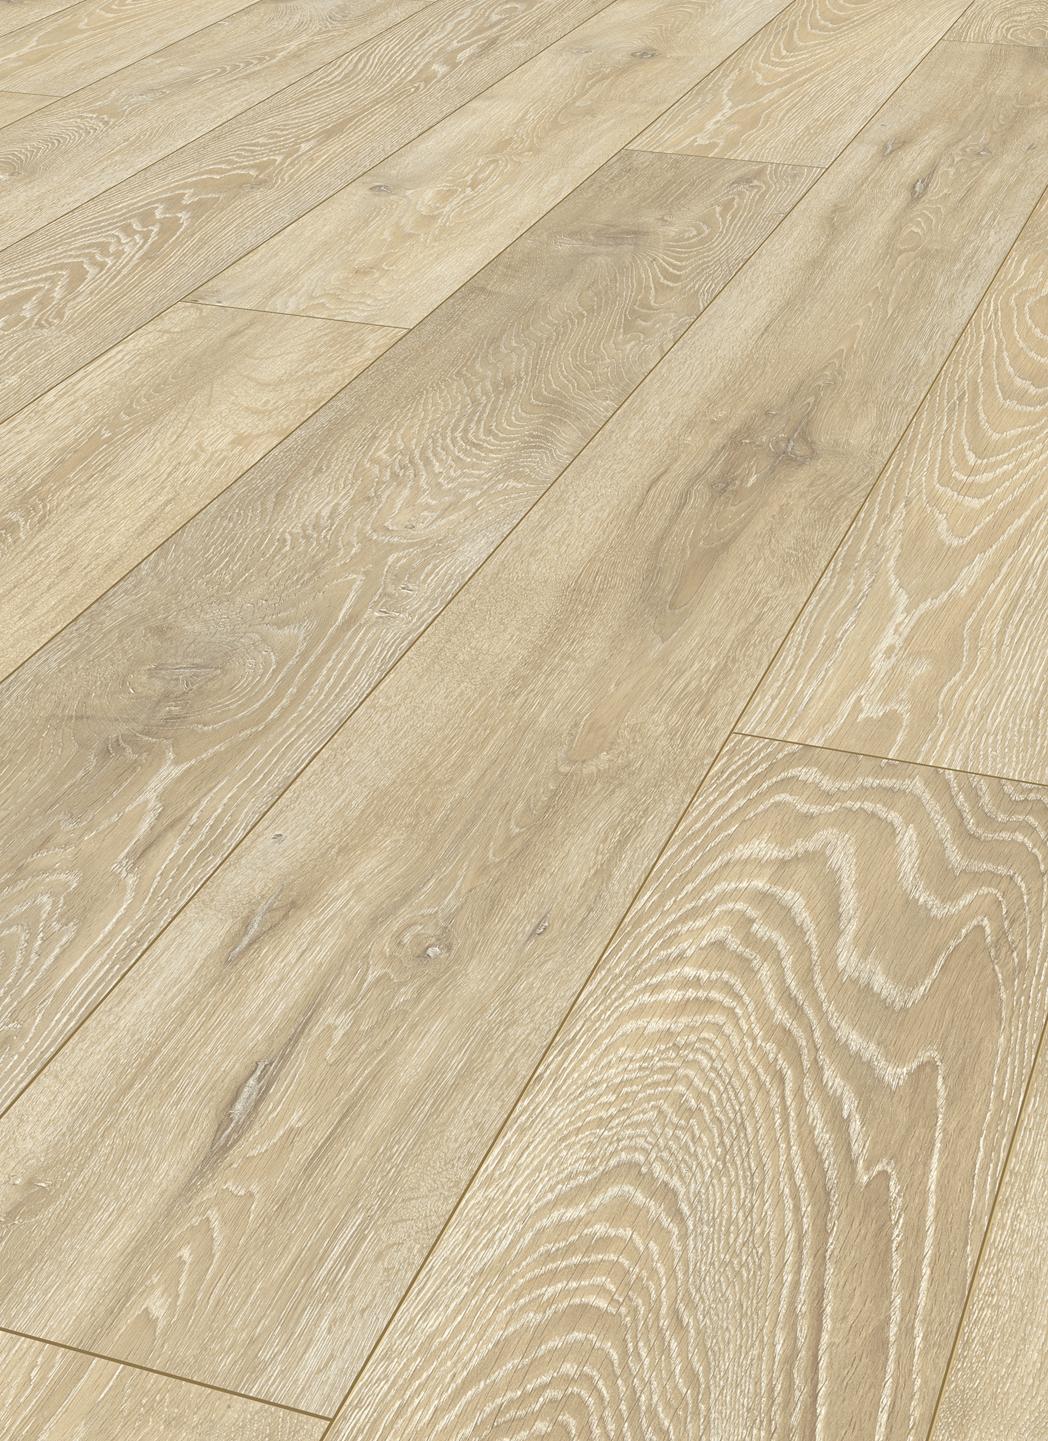 Laminate long boards oak pastel beige for london for Laminate flooring london